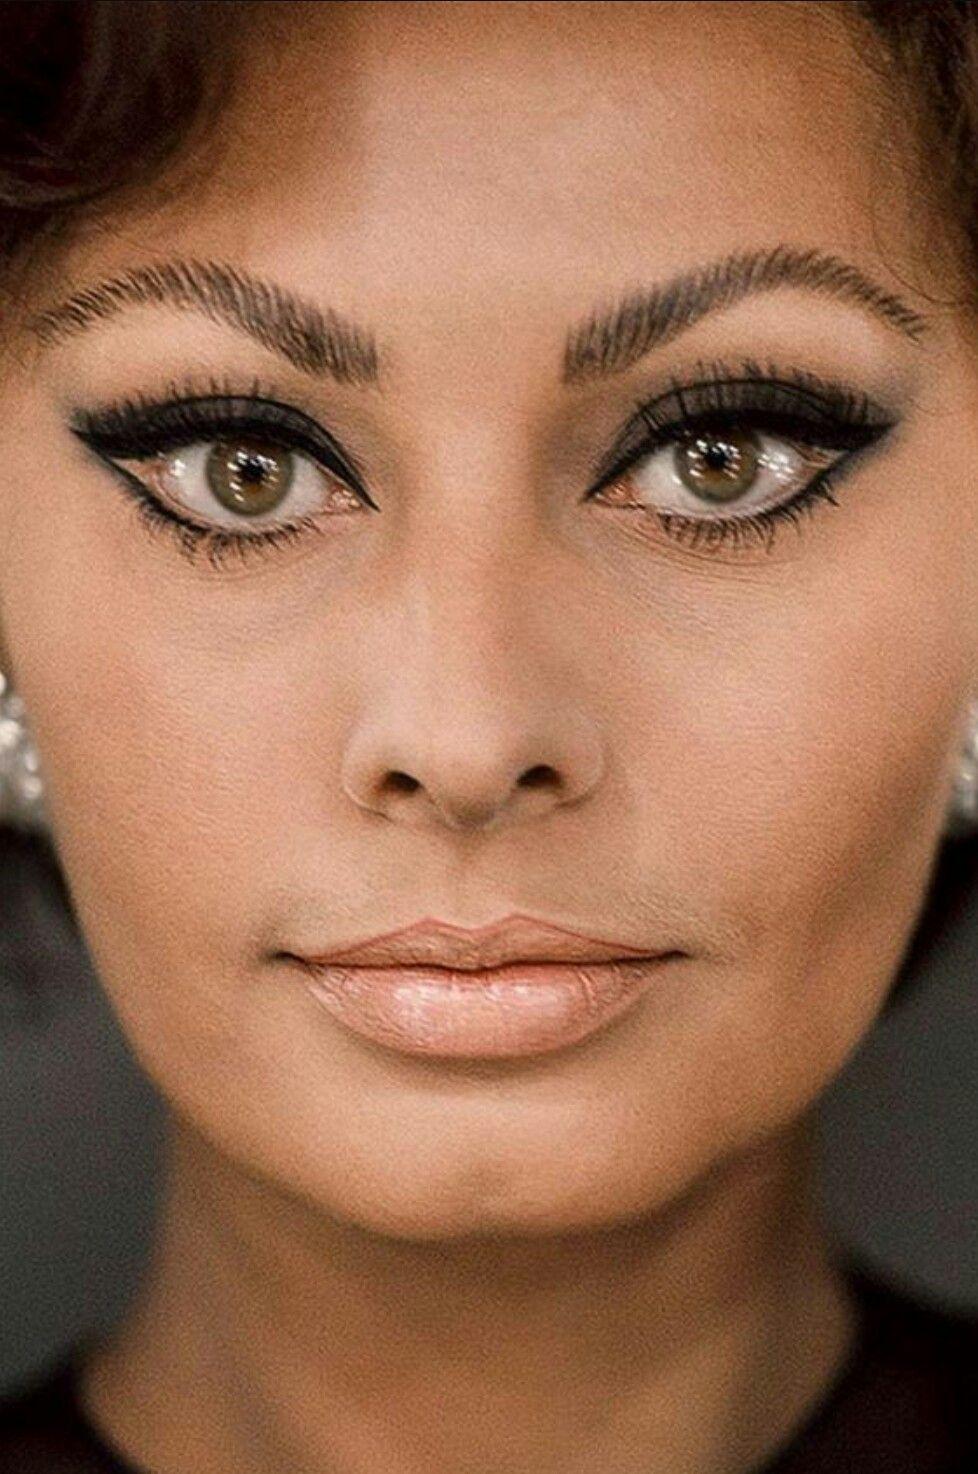 Sophia Loren Such Beautiful Eyes Sophia Loren Makeup Sophia Loren Vintage Makeup